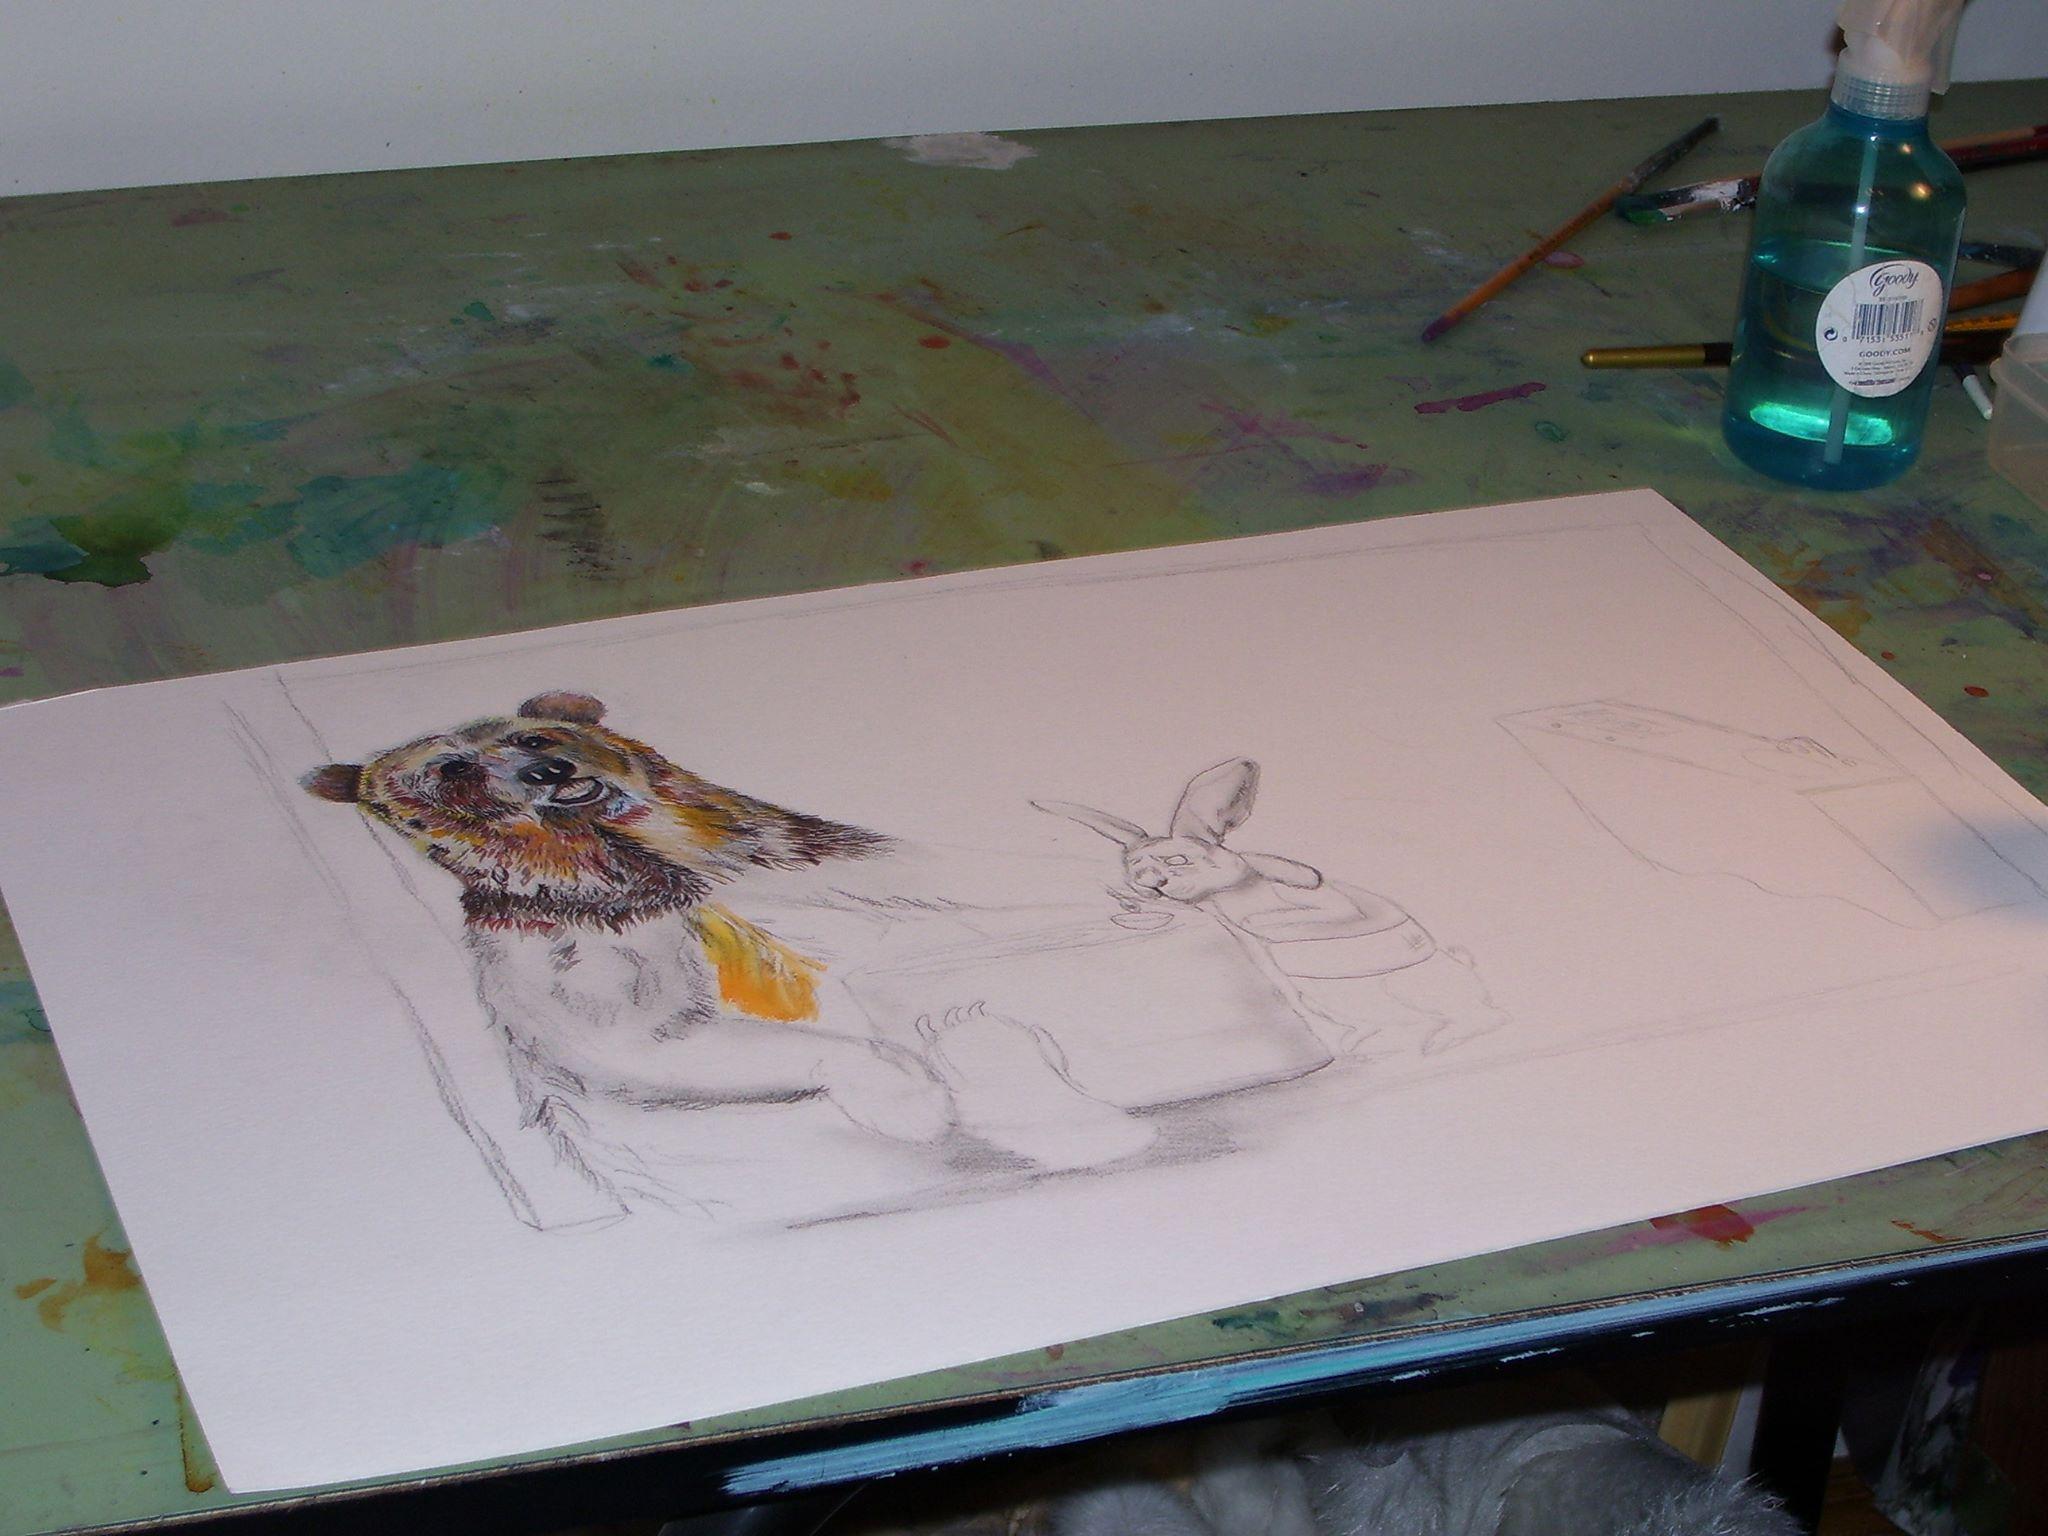 artistic process